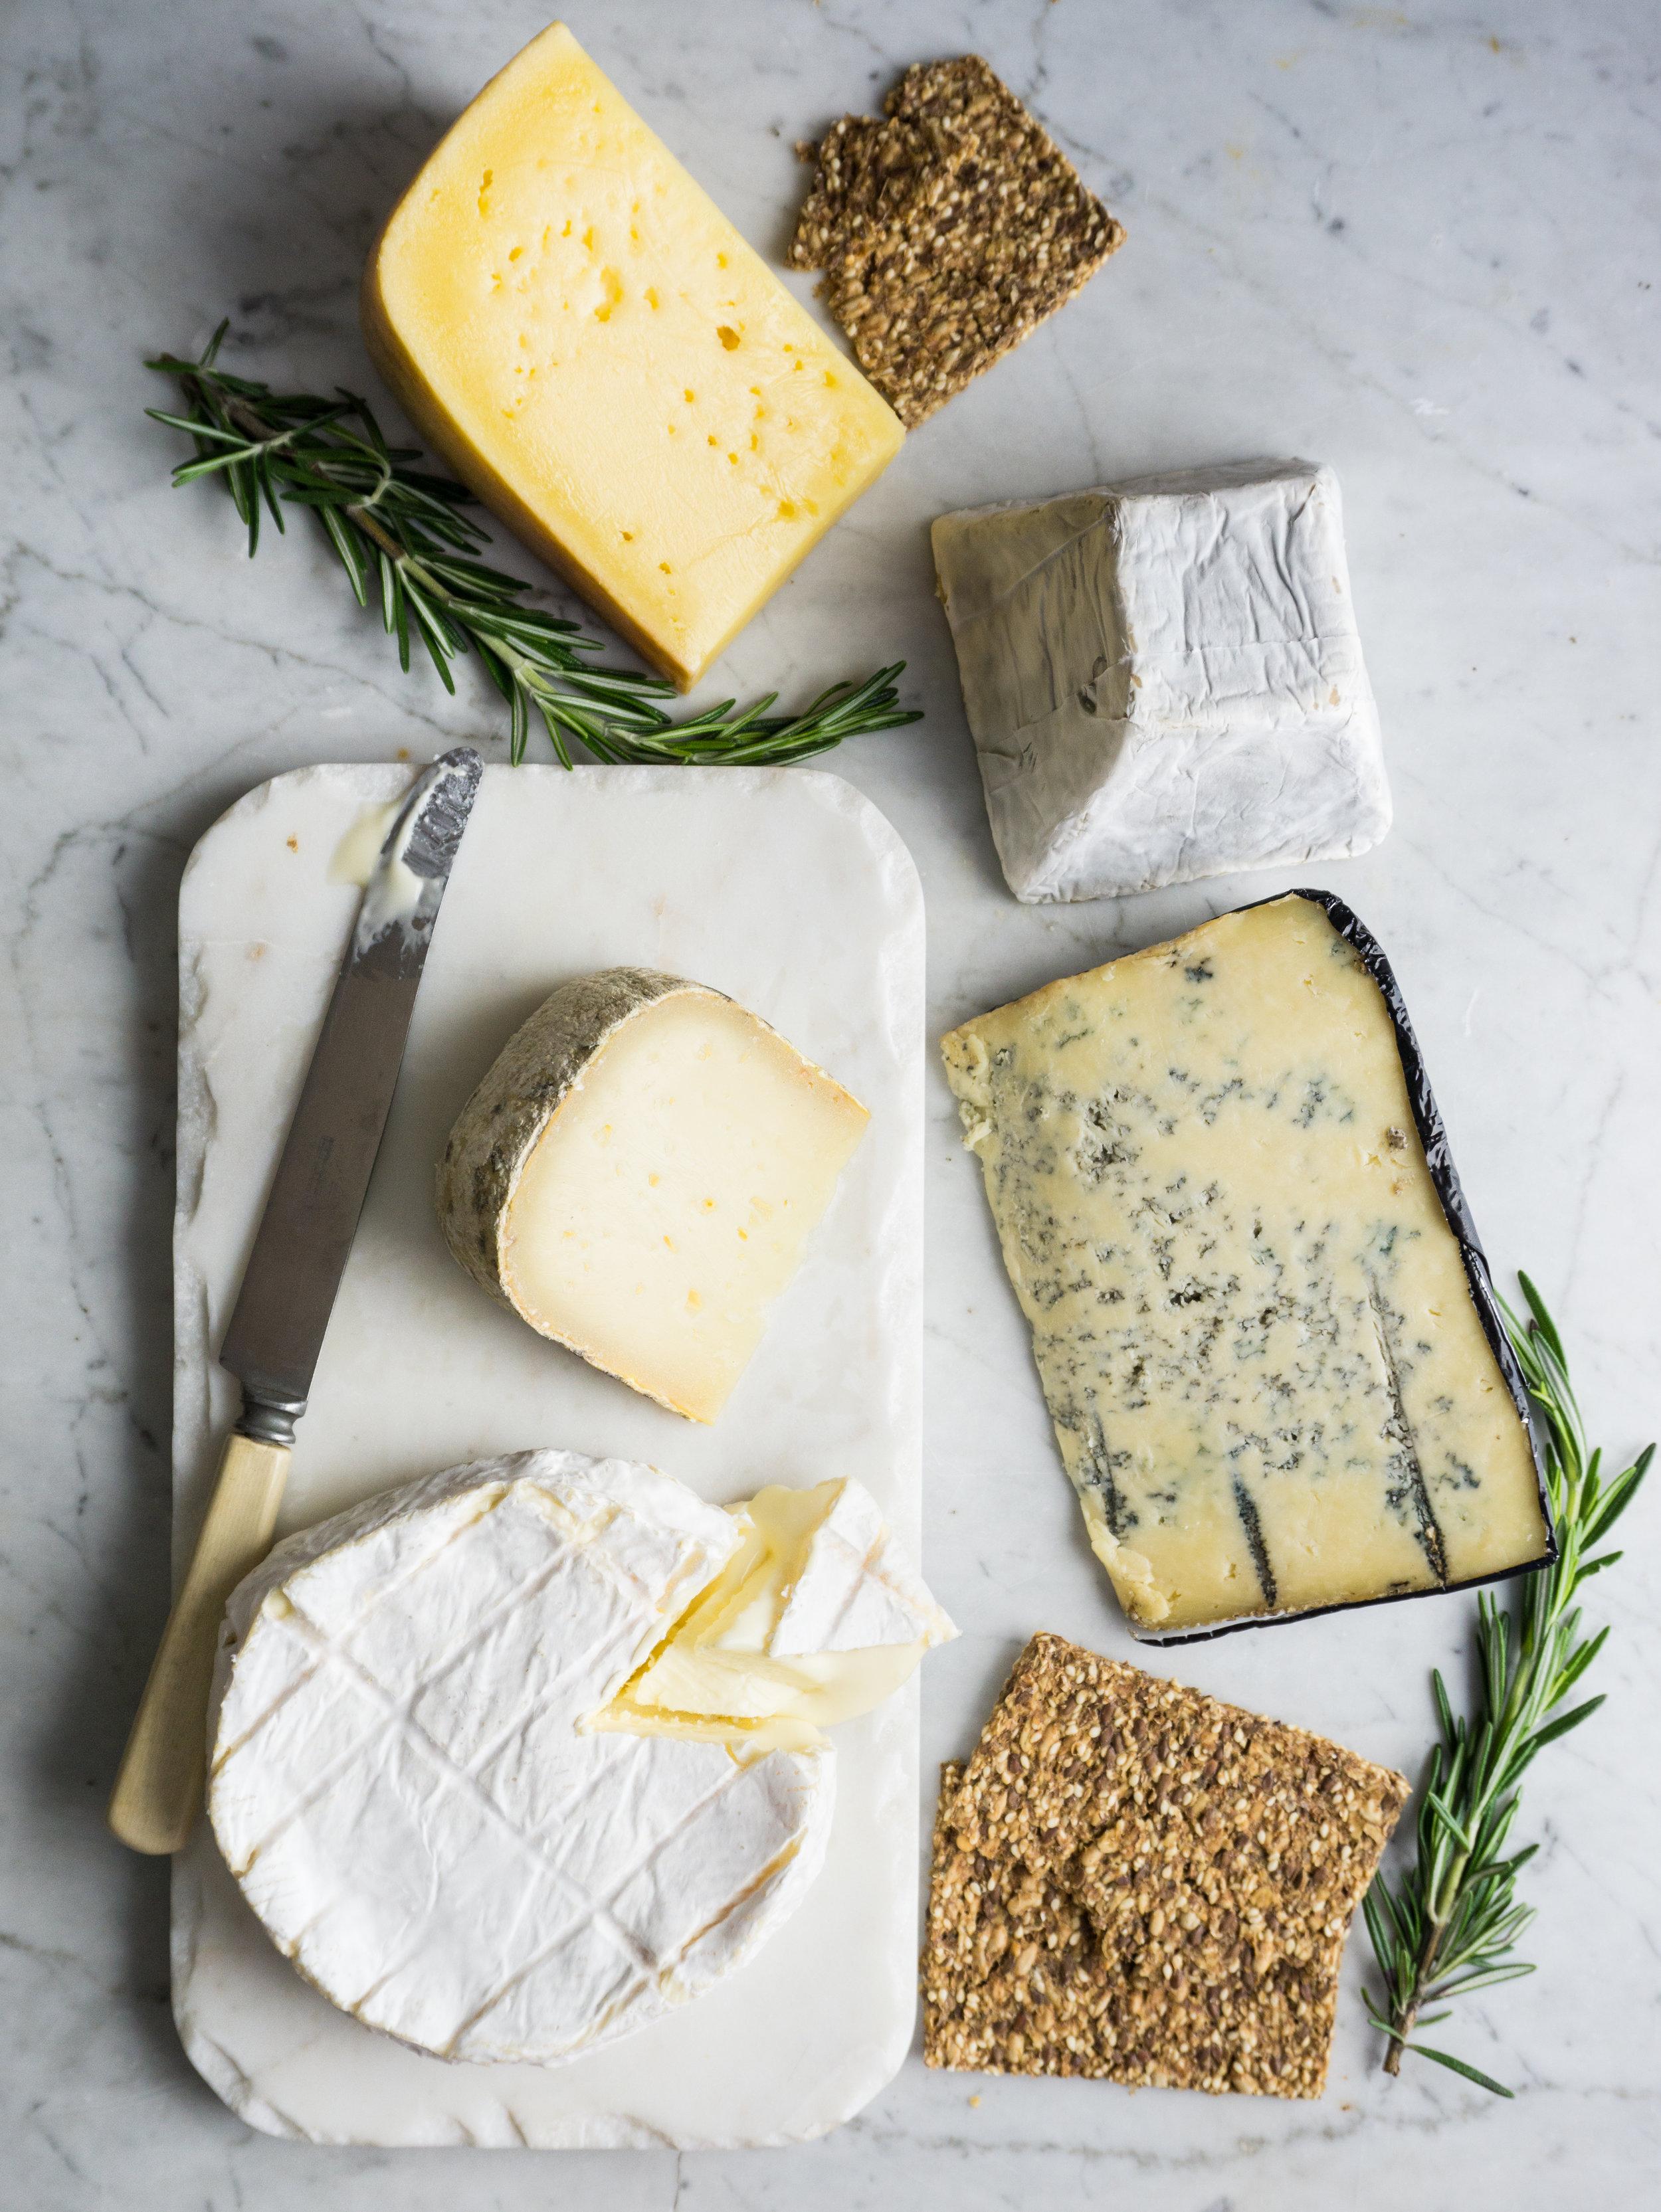 Massachusetts cheese varieties. From top:  Robinson Family Swiss - Robinson Farm's  (Hardwick, MA.) , Ellie's Cloudy Down - Ruggles Hill Creamery  (Hardwick, MA.) , sheep's milk Evelina  -  Couët Farm & Fromagerie  (Dudley, MA.) , Bluebird - Grey Barn  (Chilmark, MA) , Sunset Hill - Appleton Farms  (Ipswich, MA.).